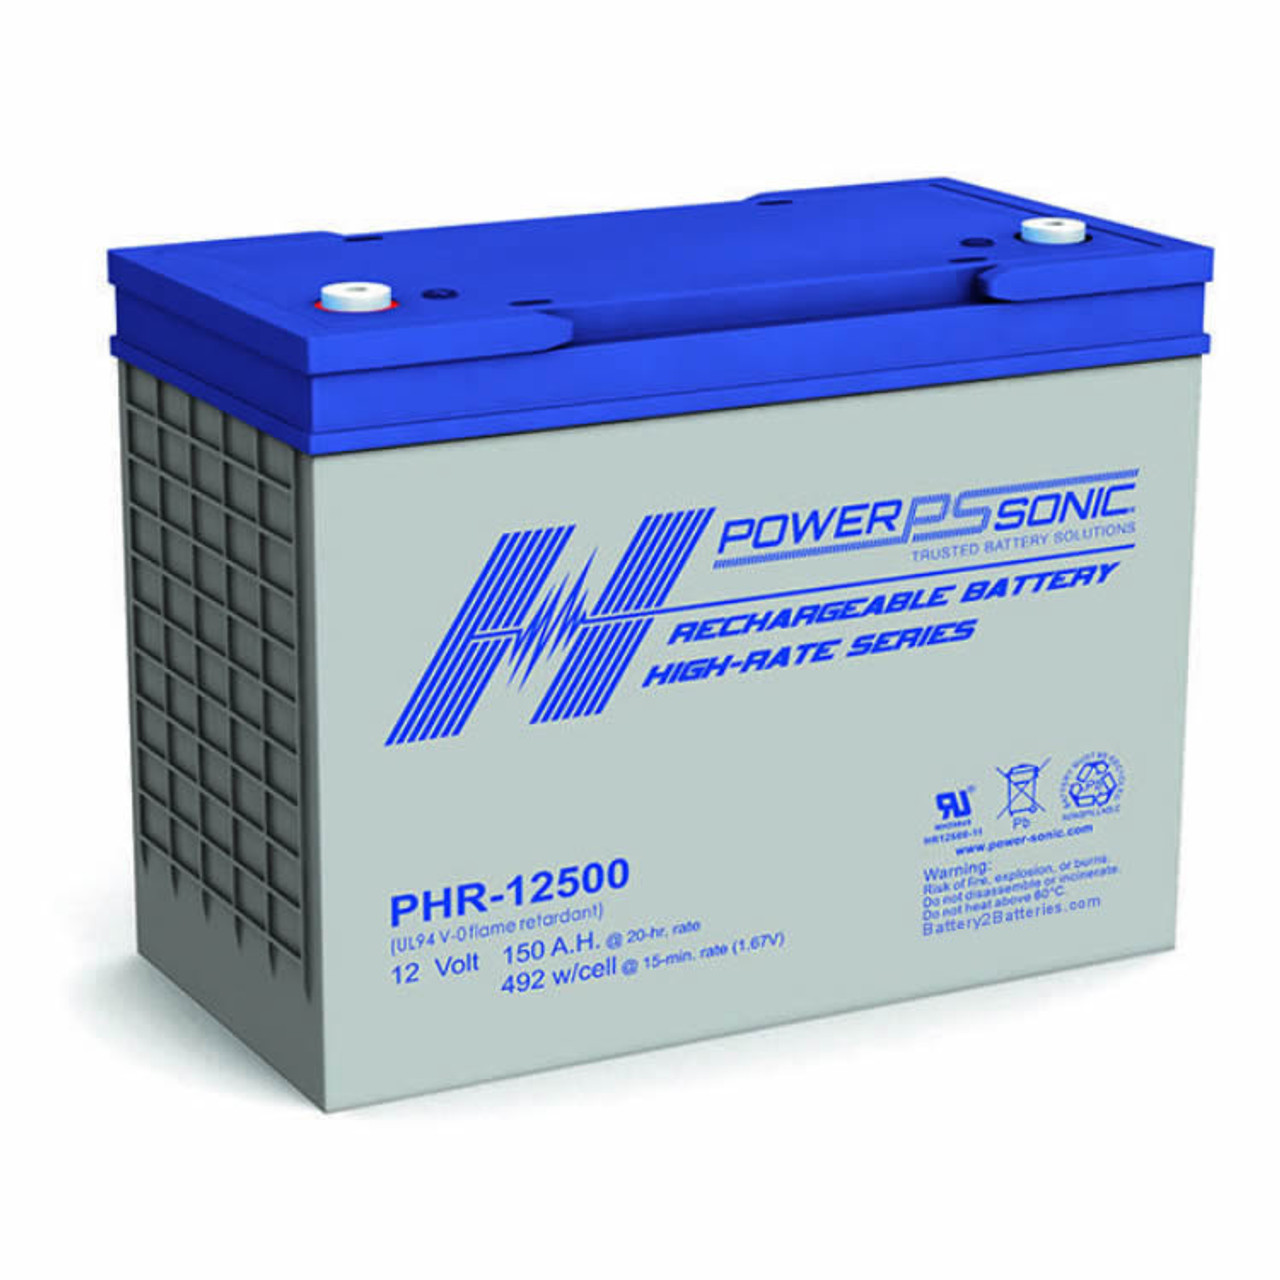 Power Sonic PHR-12500 Battery